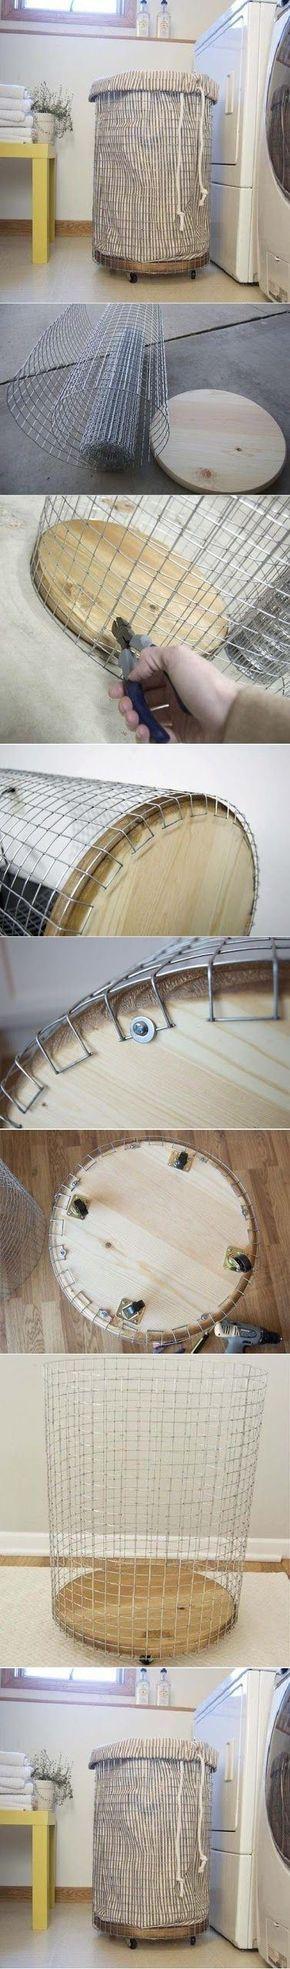 DIY Easy Laundry Basket.